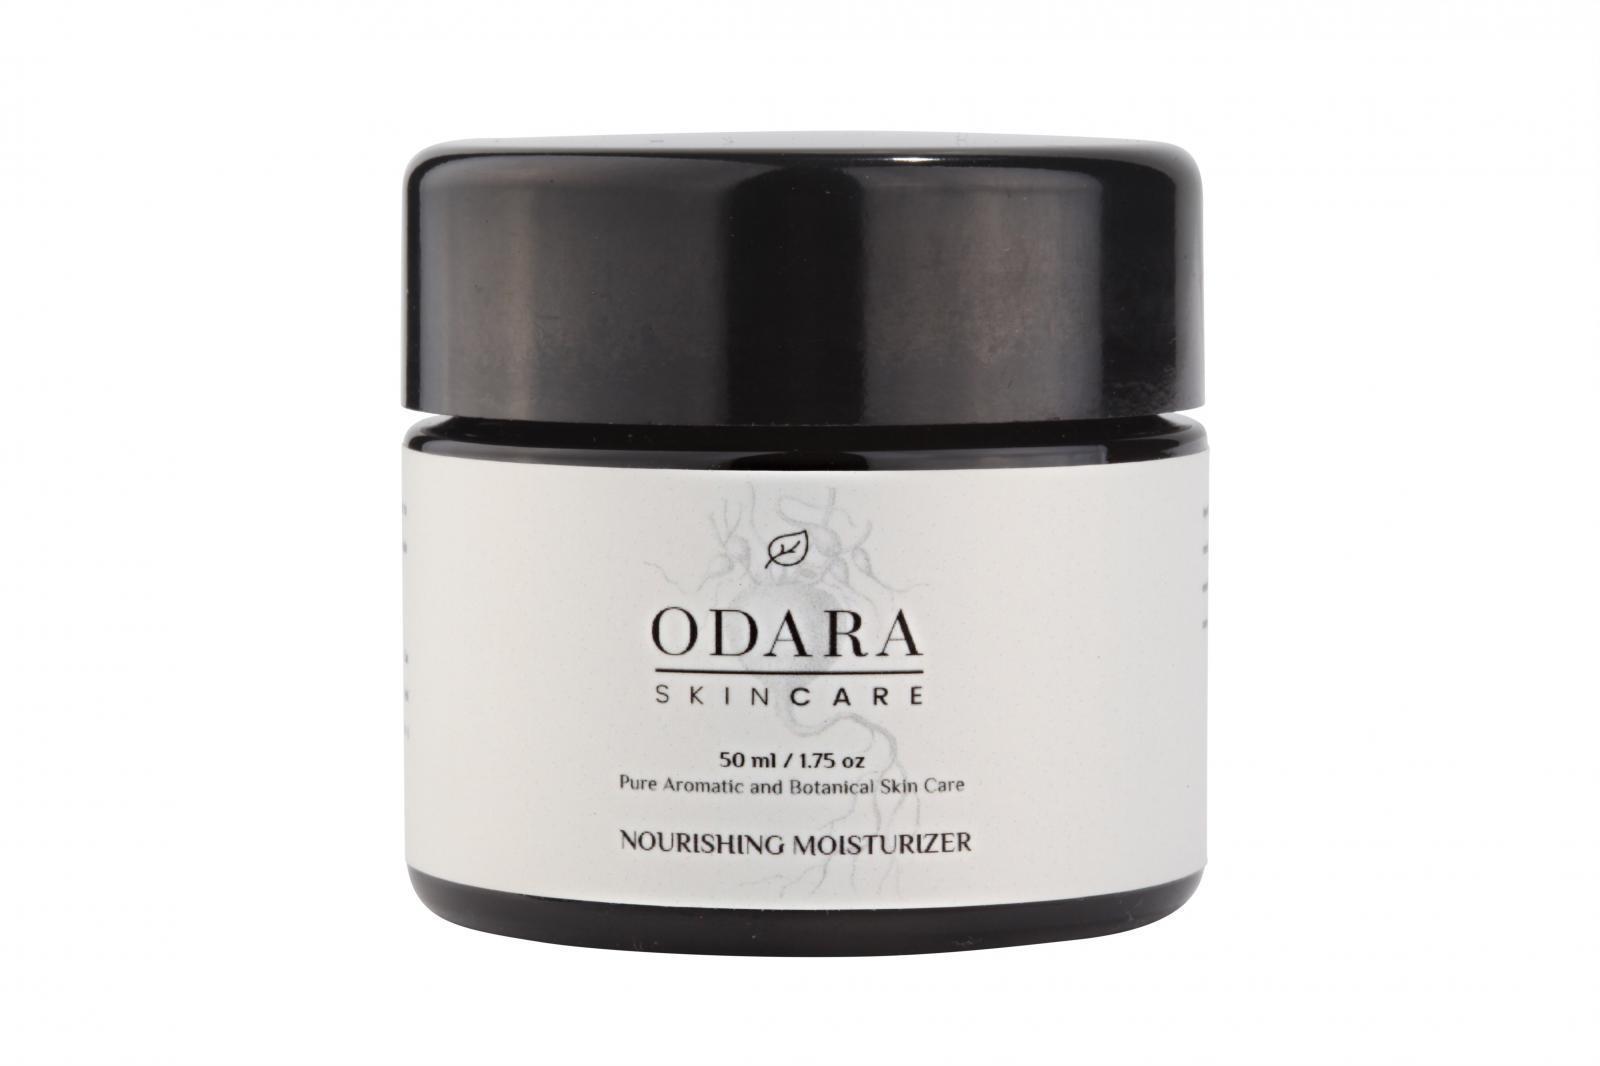 ODARA Nourishing Moisturizer 50 ml